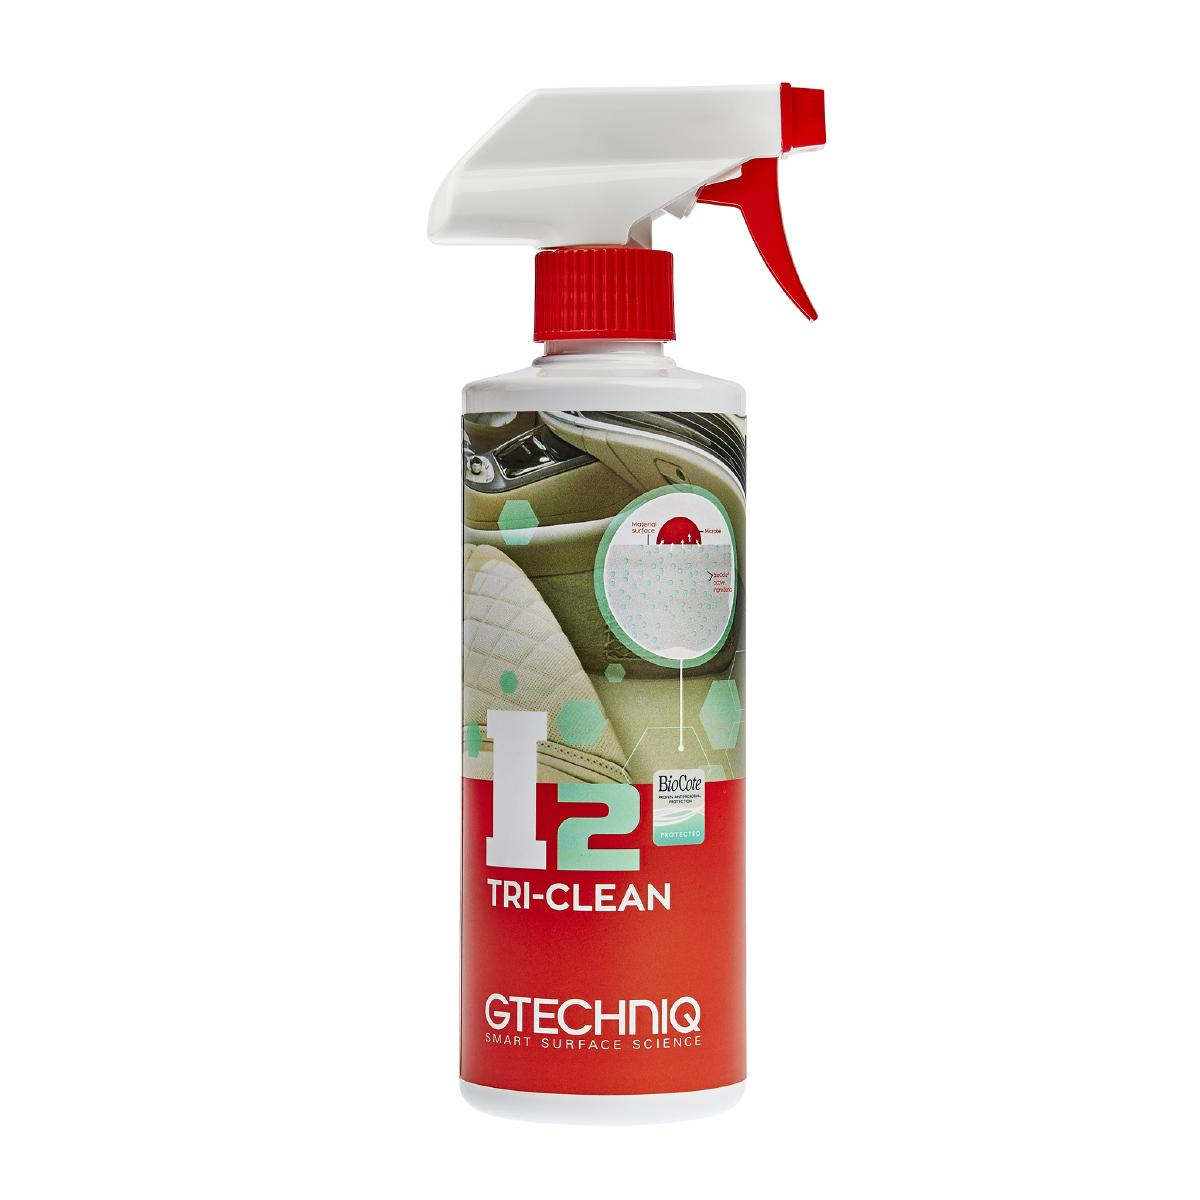 Interiörrengöring Gtechniq I2 Tri-Clean, 500 ml